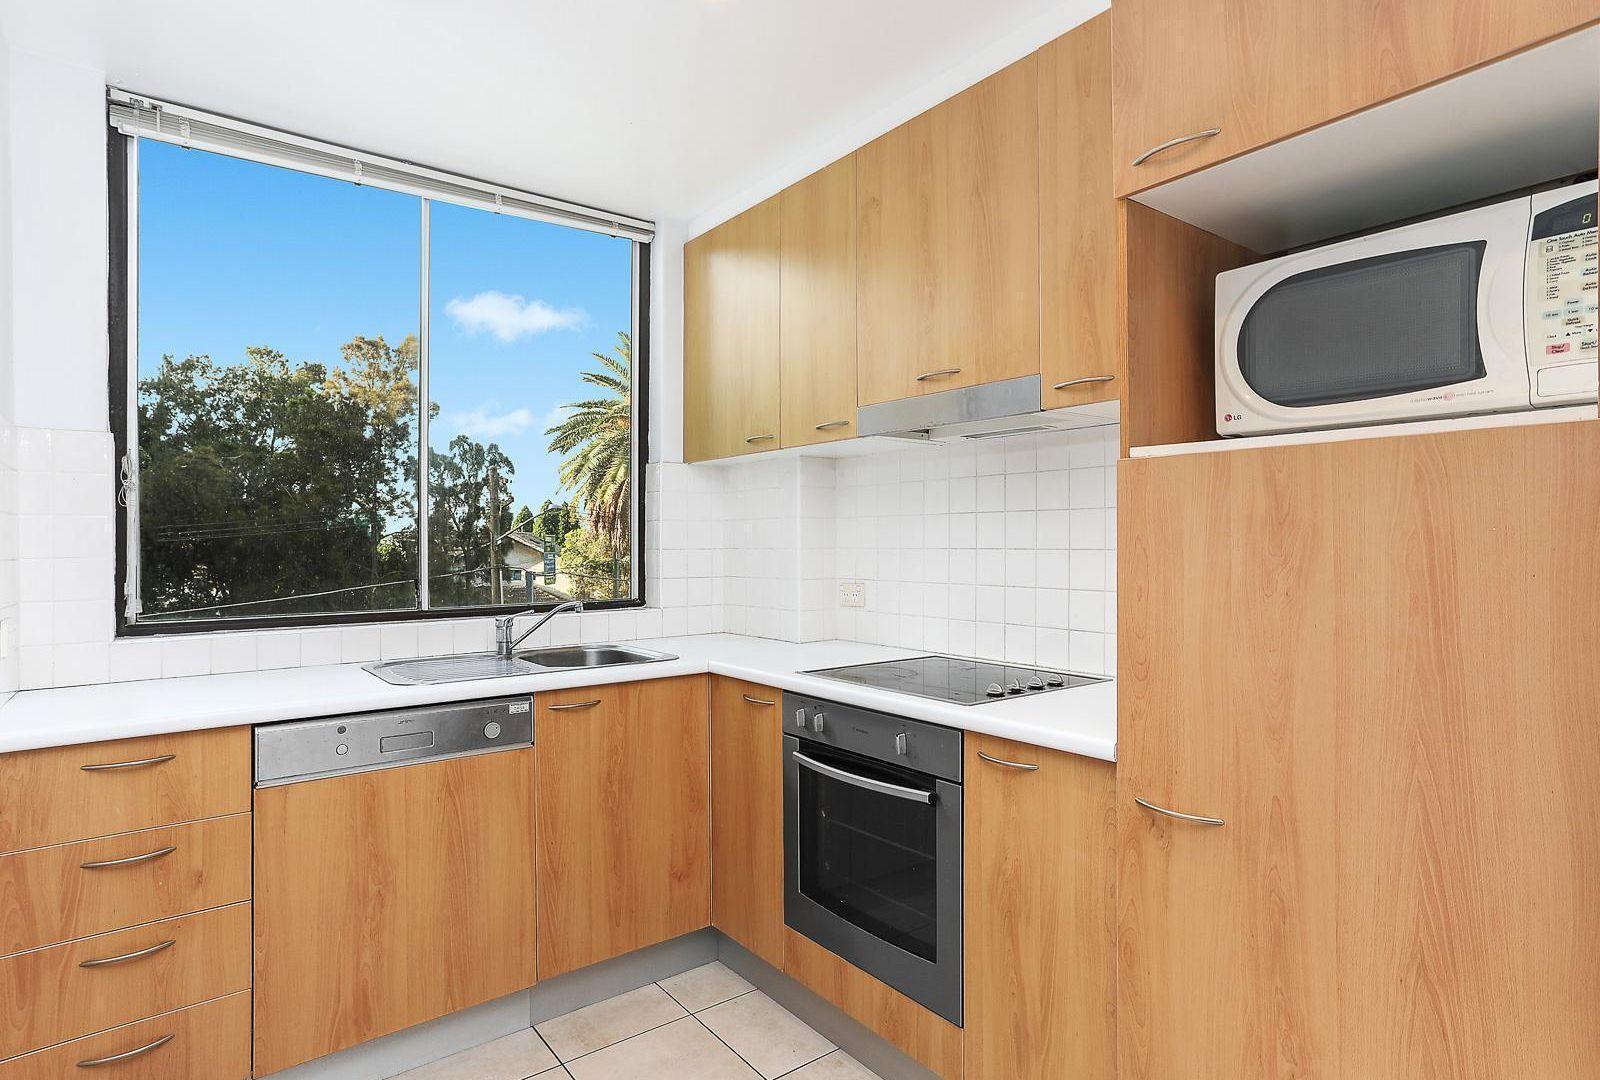 1A/15-19 Waverley Crescent, Bondi Junction NSW 2022, Image 2